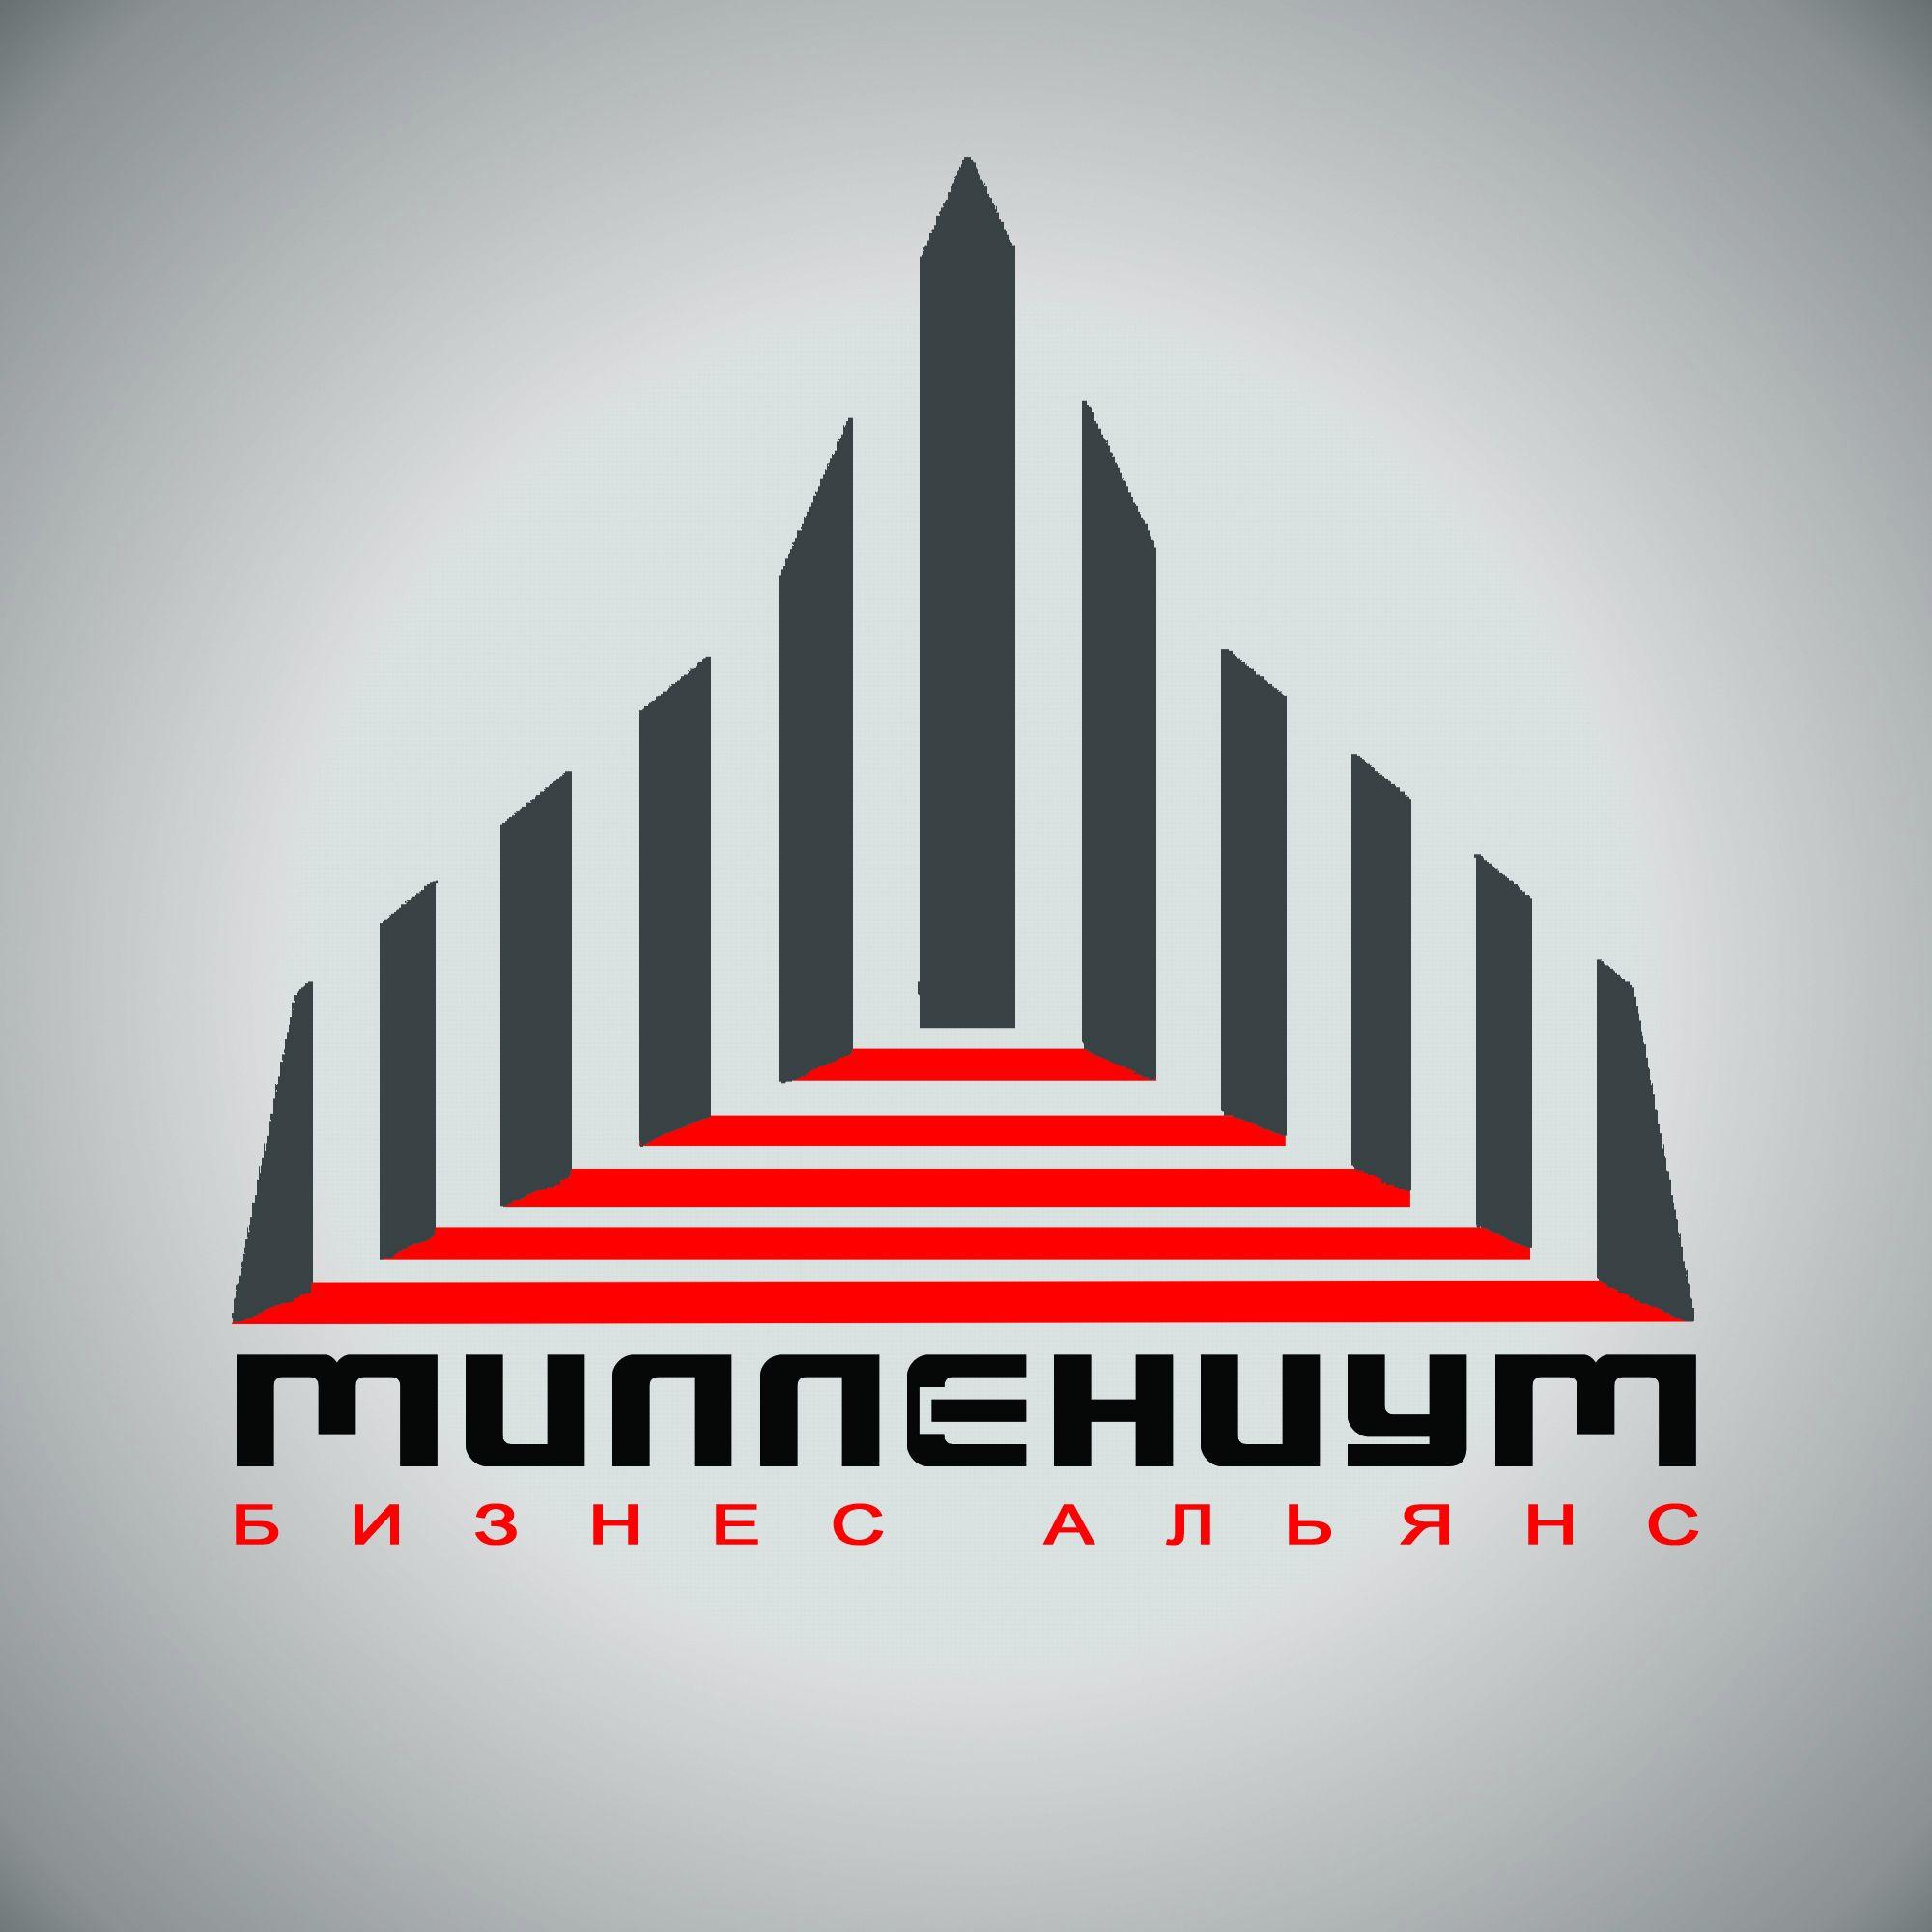 Бизнес Альянс Милленниум - дизайнер Olya52ru